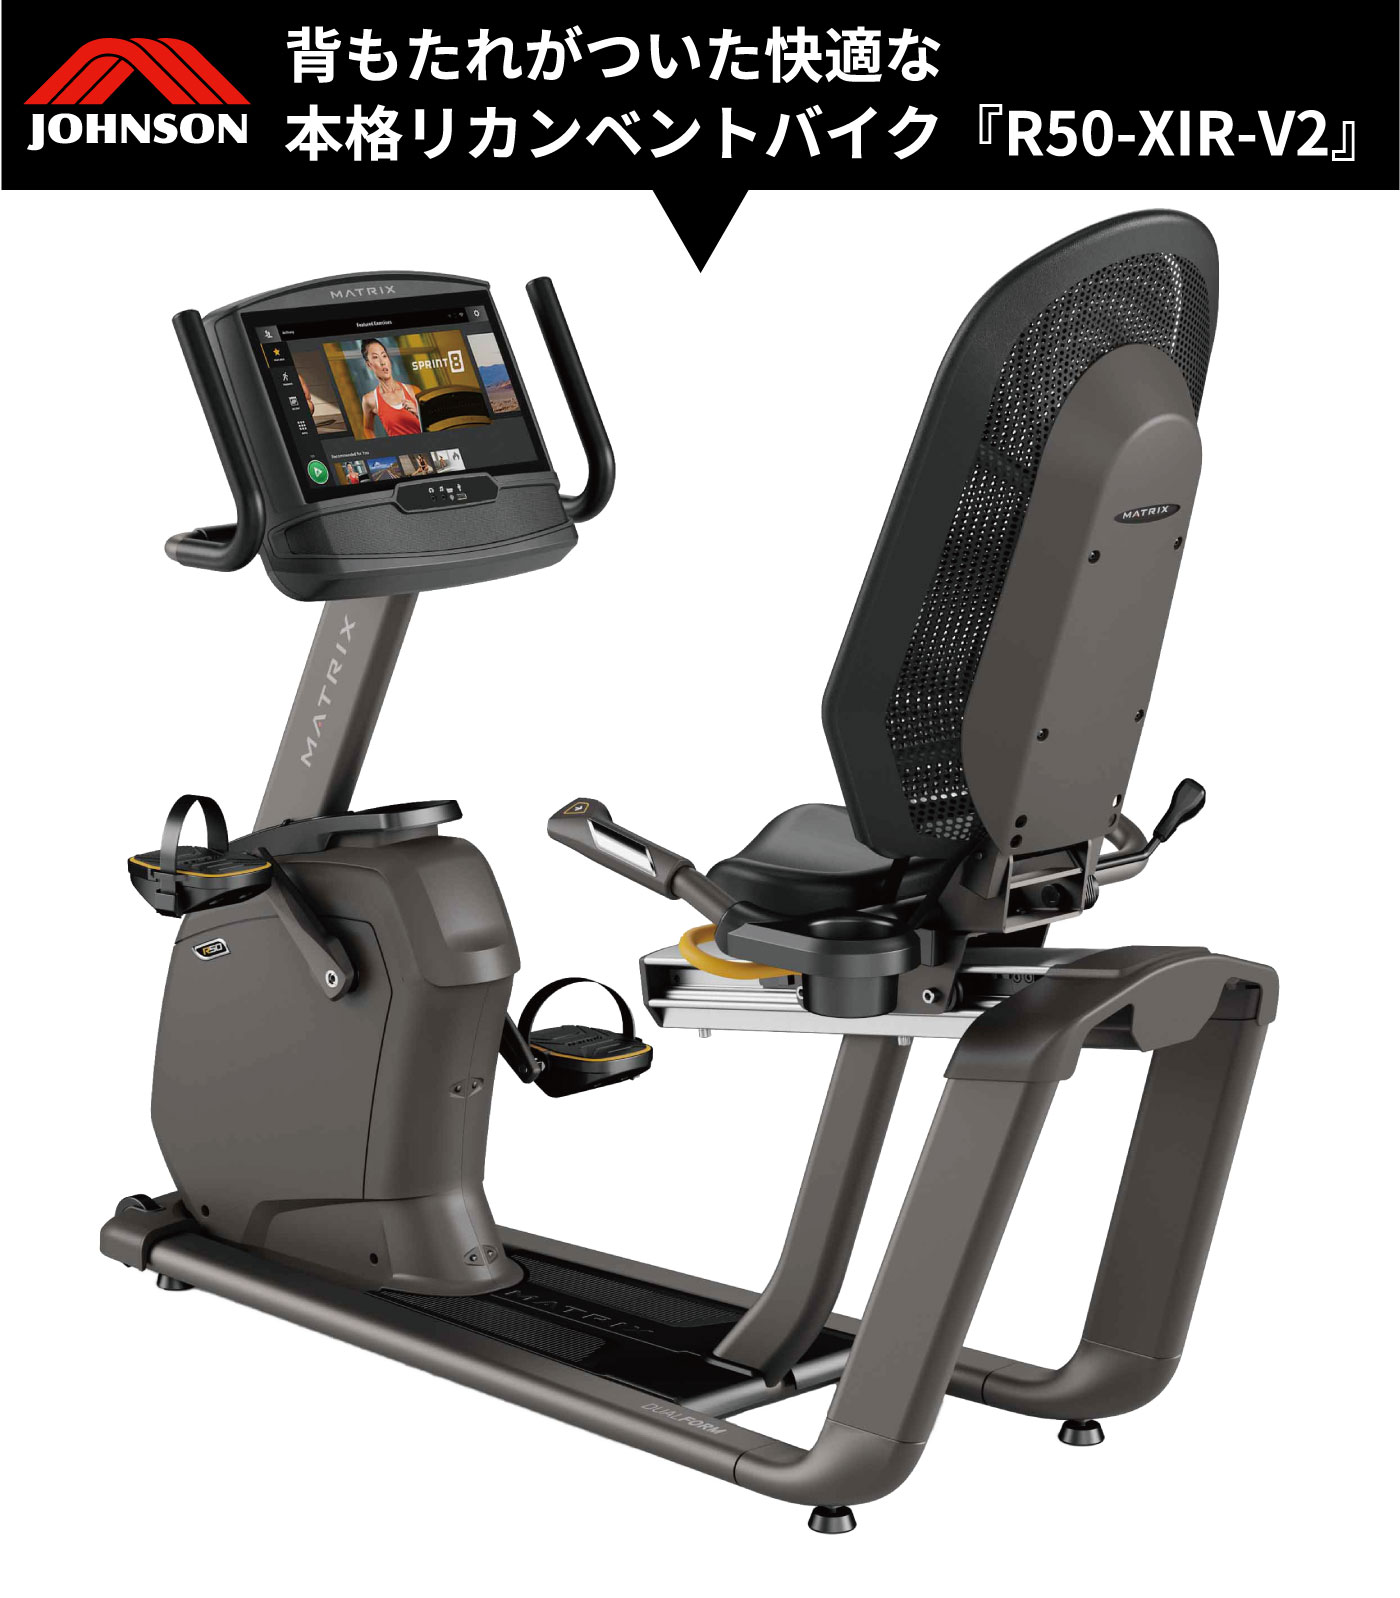 R50-XIR-V2